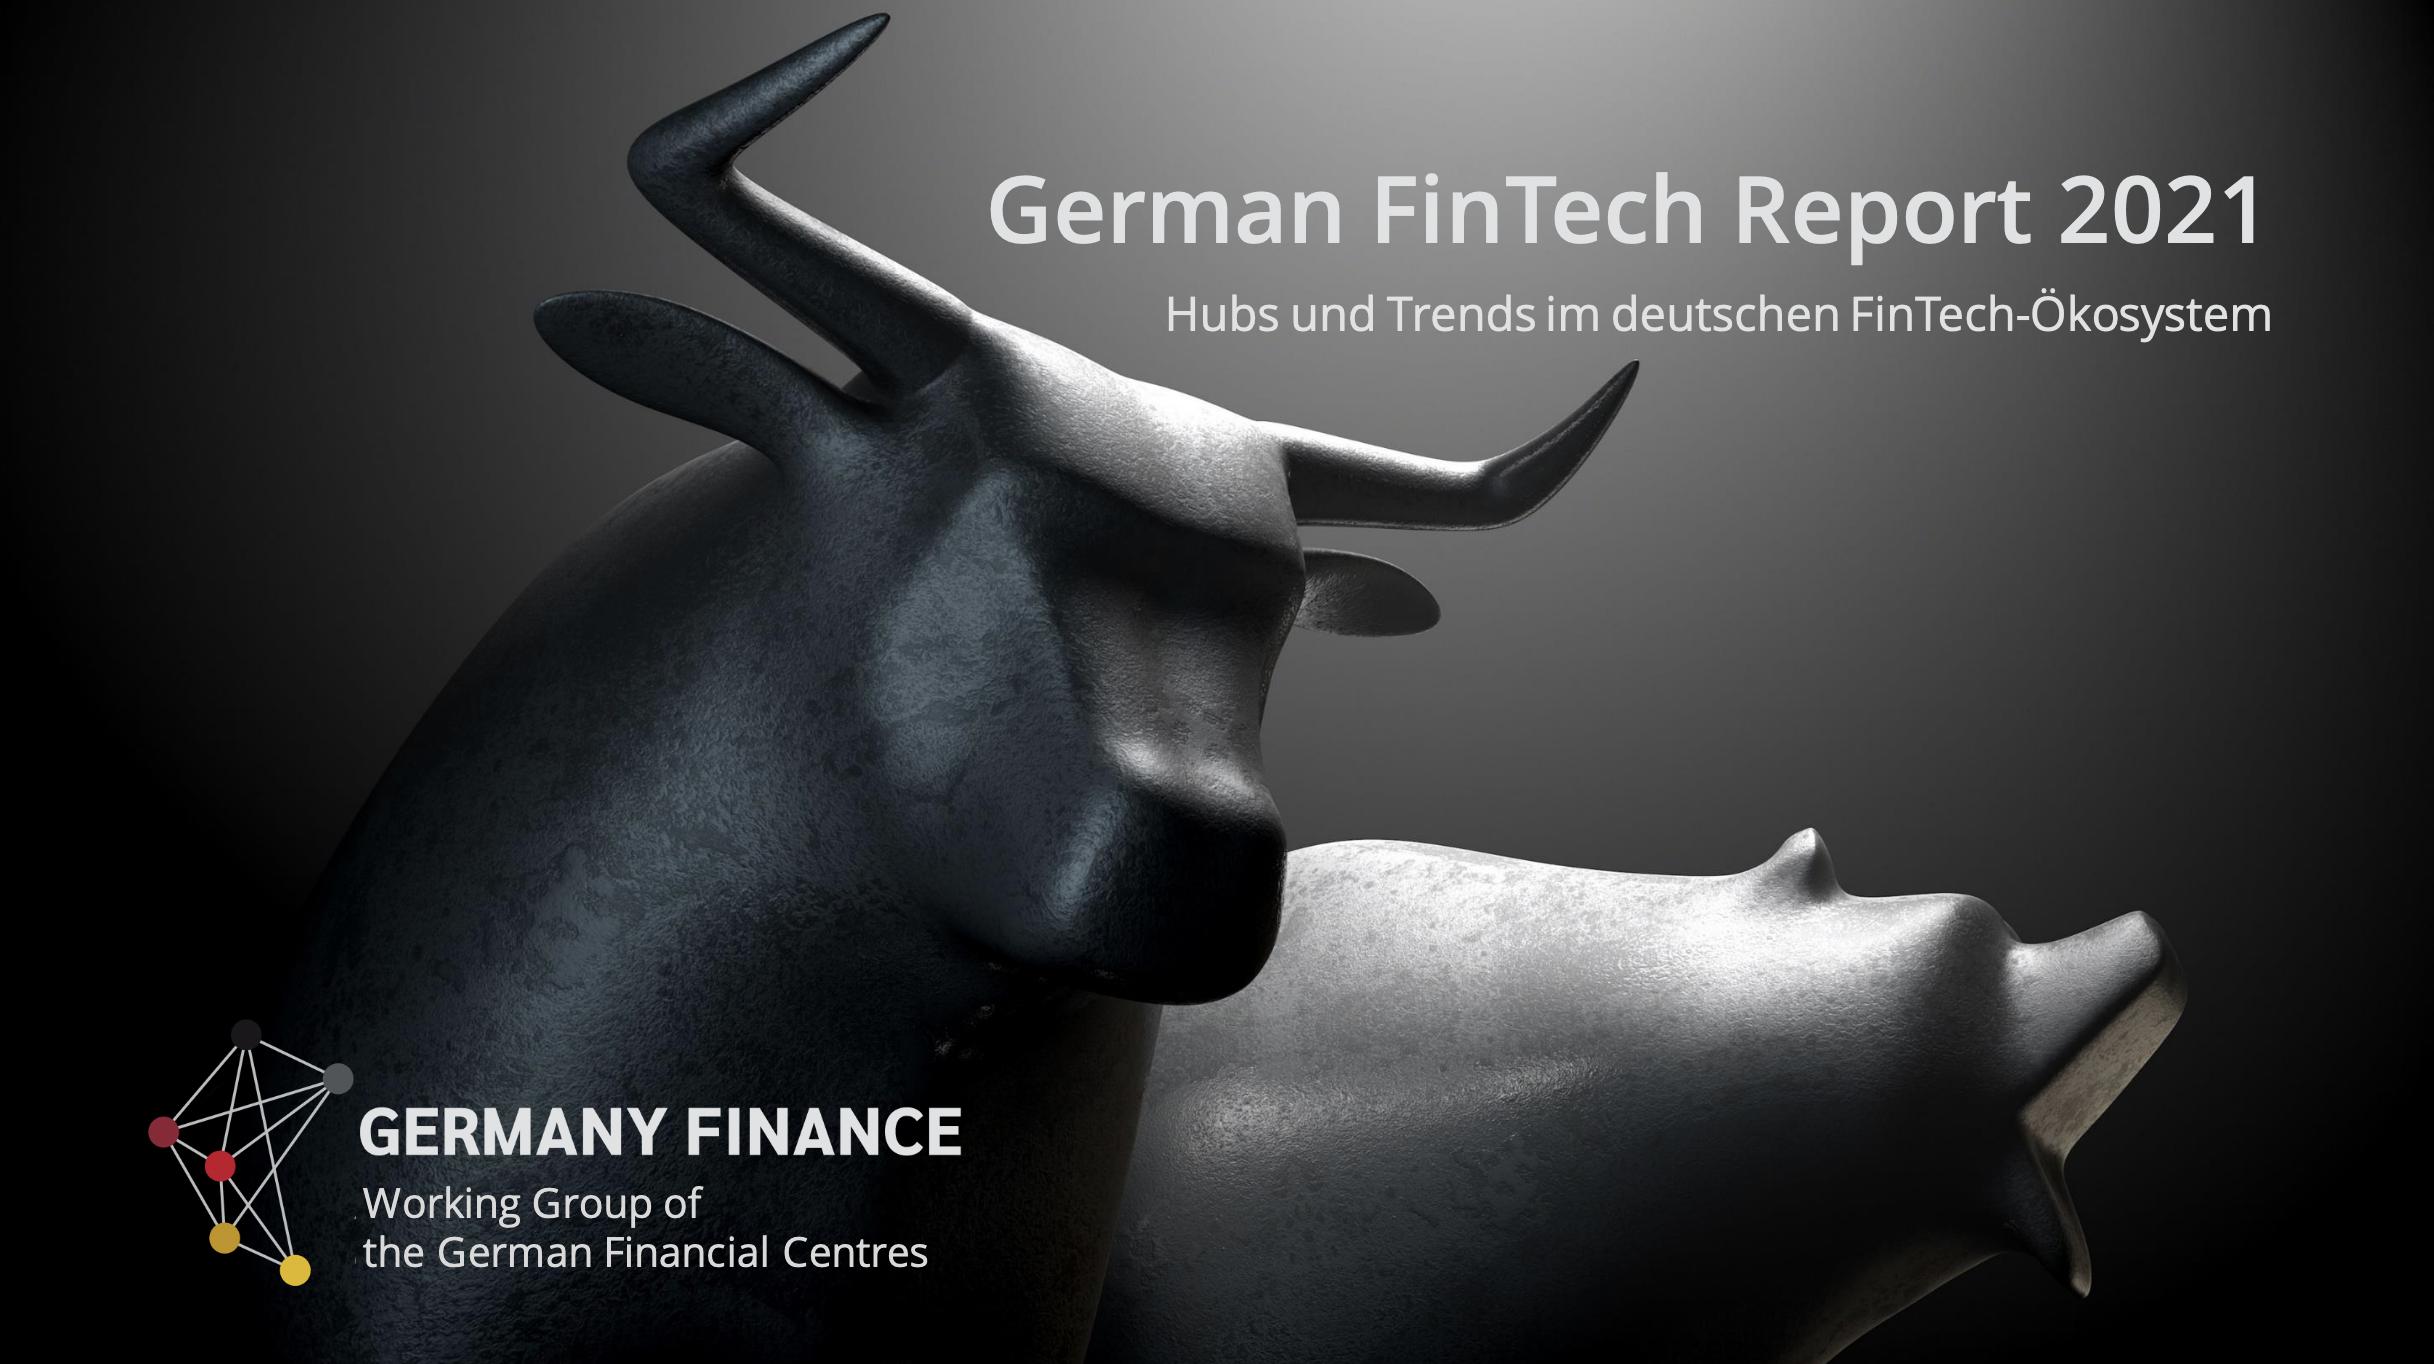 Germany Finance veröffentlicht den German Fintech Report 2021